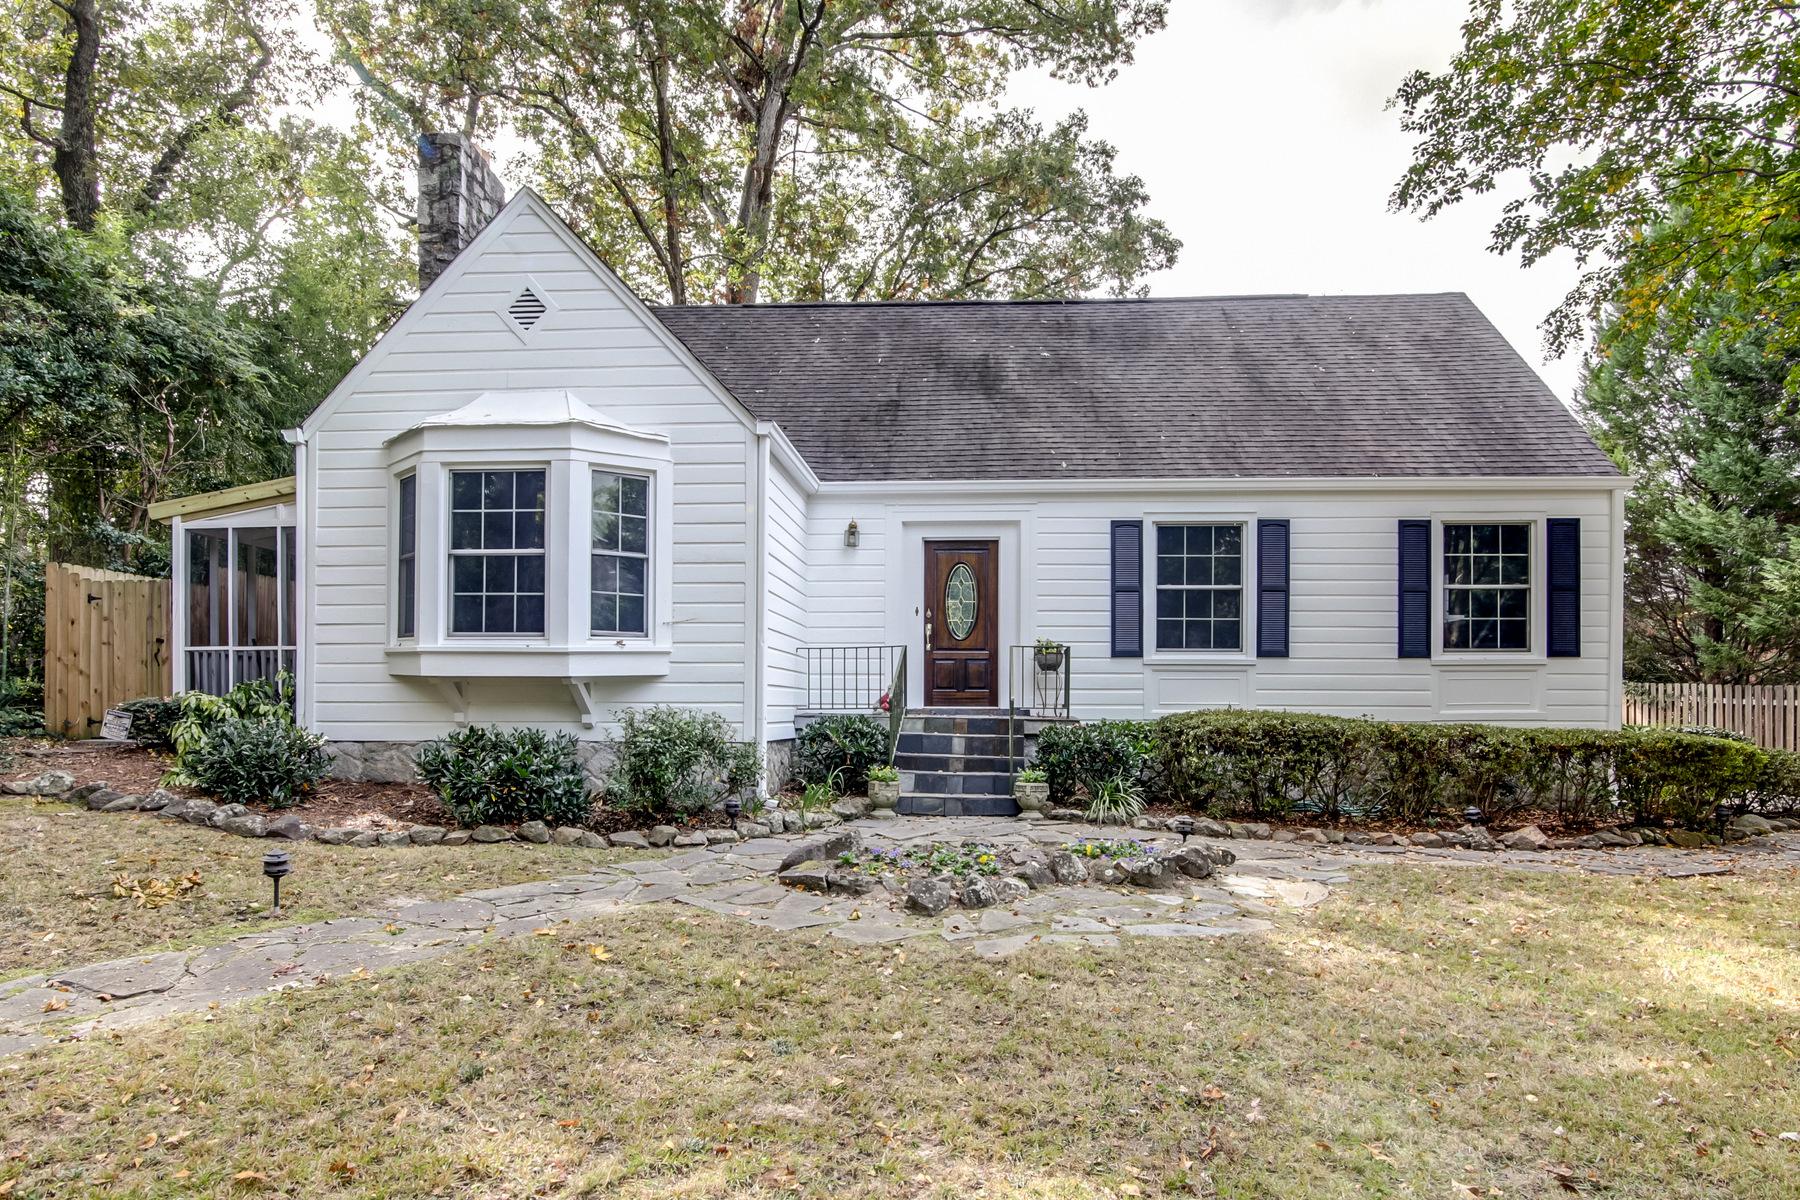 Single Family Home for Sale at Brookhaven 2706 Osborne Road Brookhaven, Atlanta, Georgia, 30319 United States